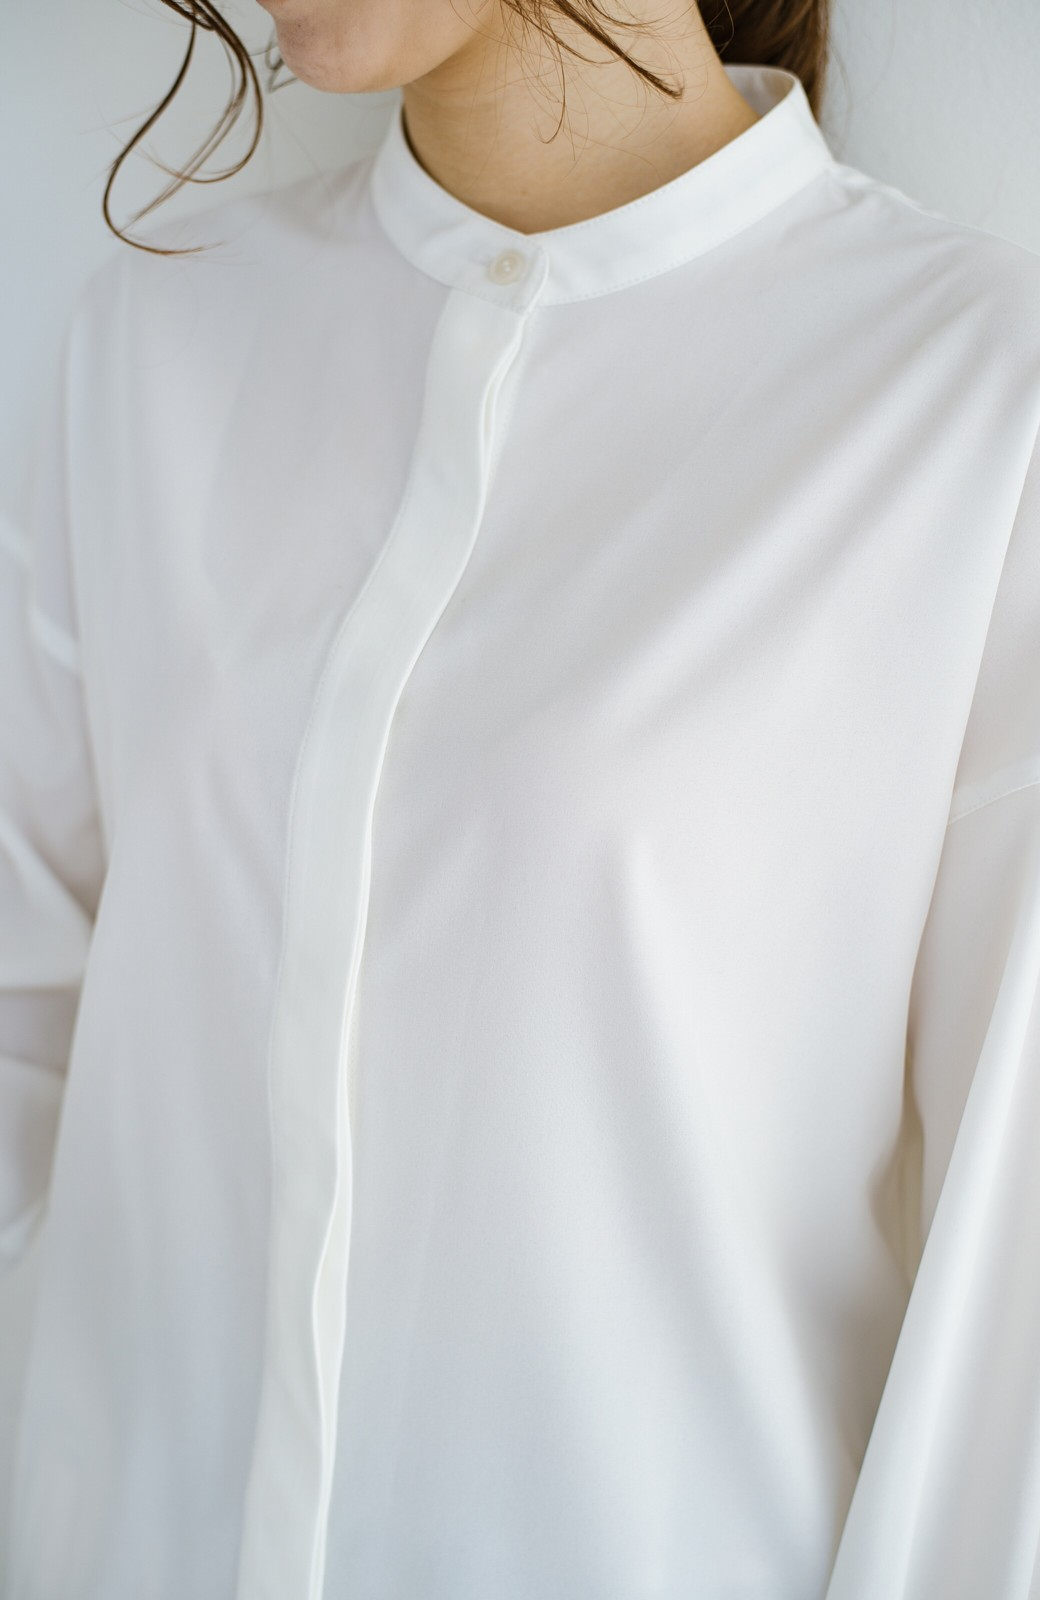 haco! 【肩幅党】肩幅広めがなんのその!華奢見せをとことん追求した重ね着にも便利なスタンドカラーシャツ <ホワイト>の商品写真3